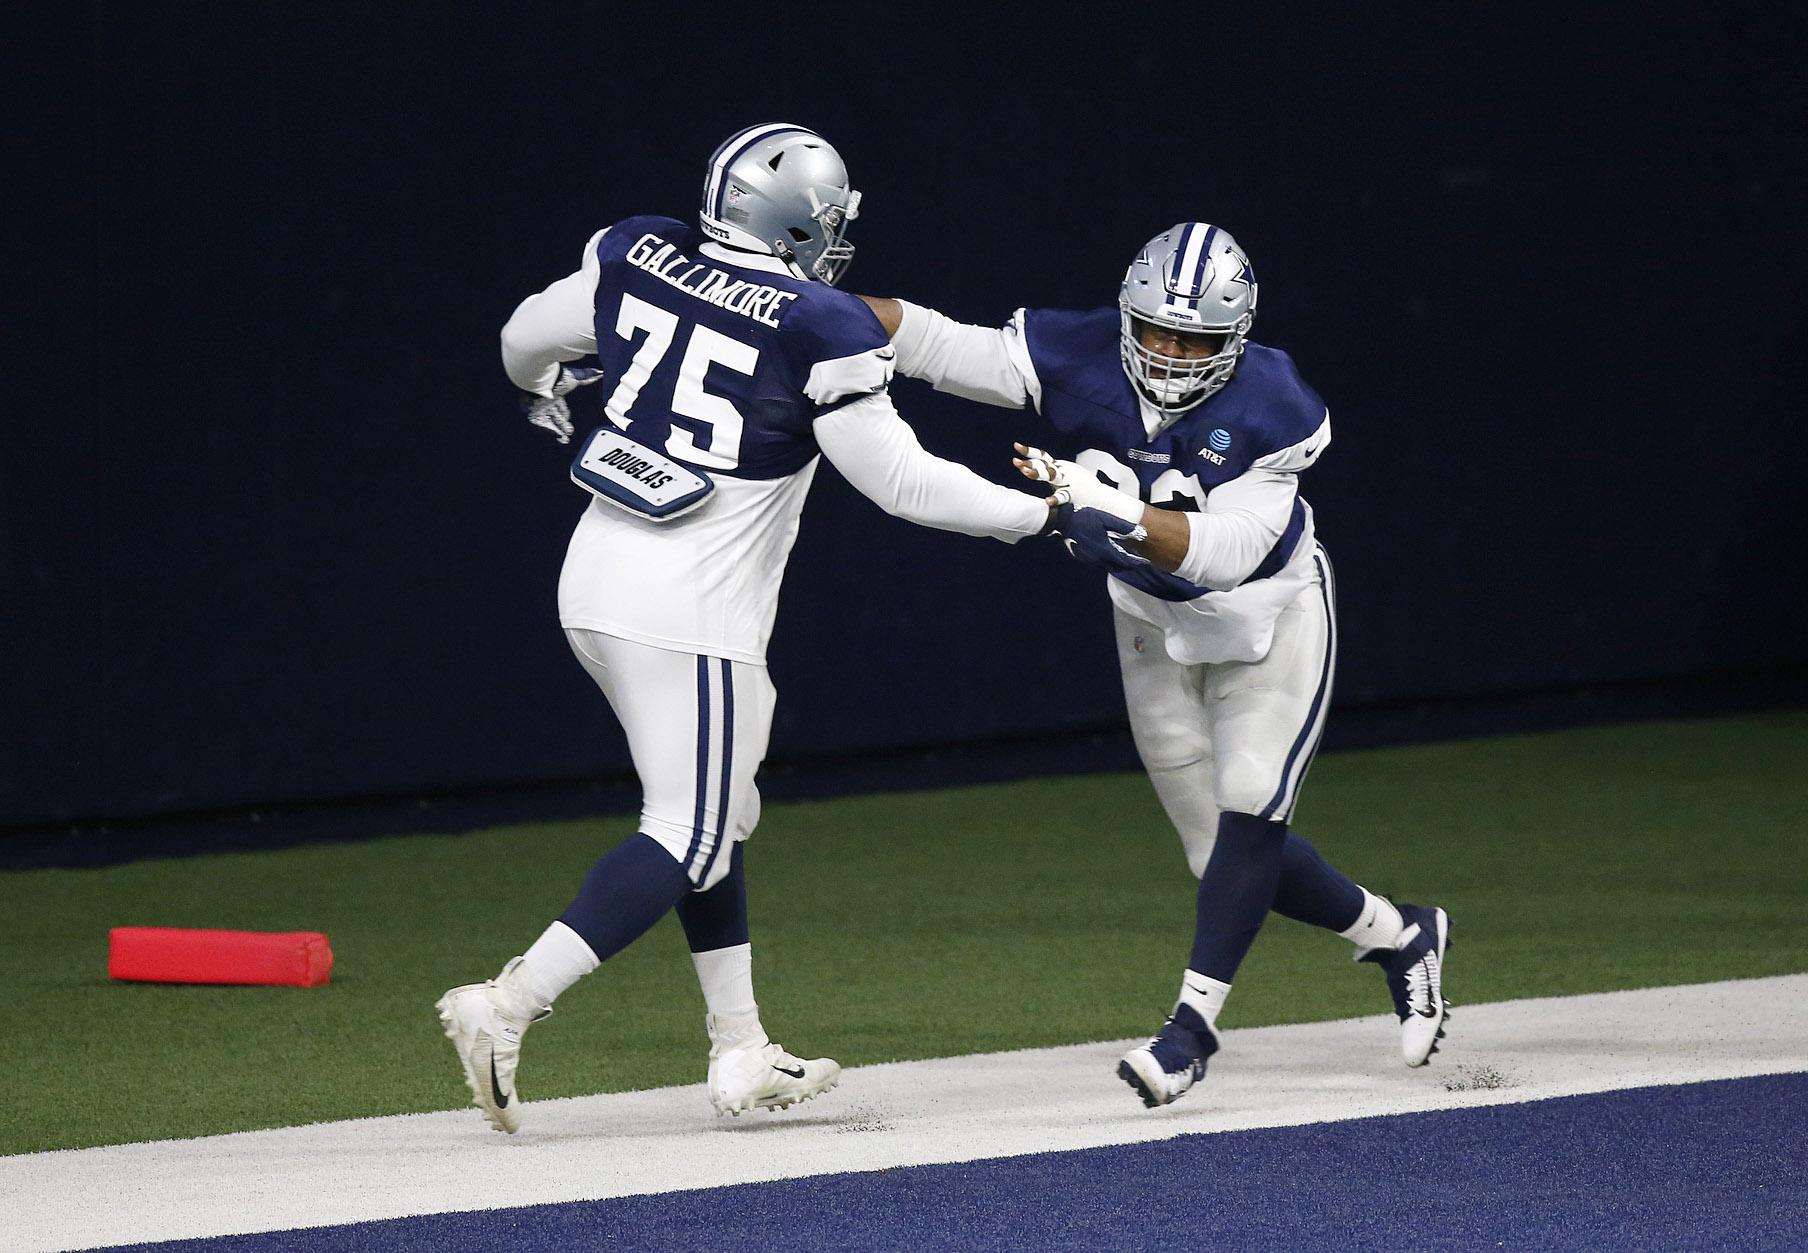 Cowboys DT Gerald McCoy ruptures quad tendon, is out for 2020 season